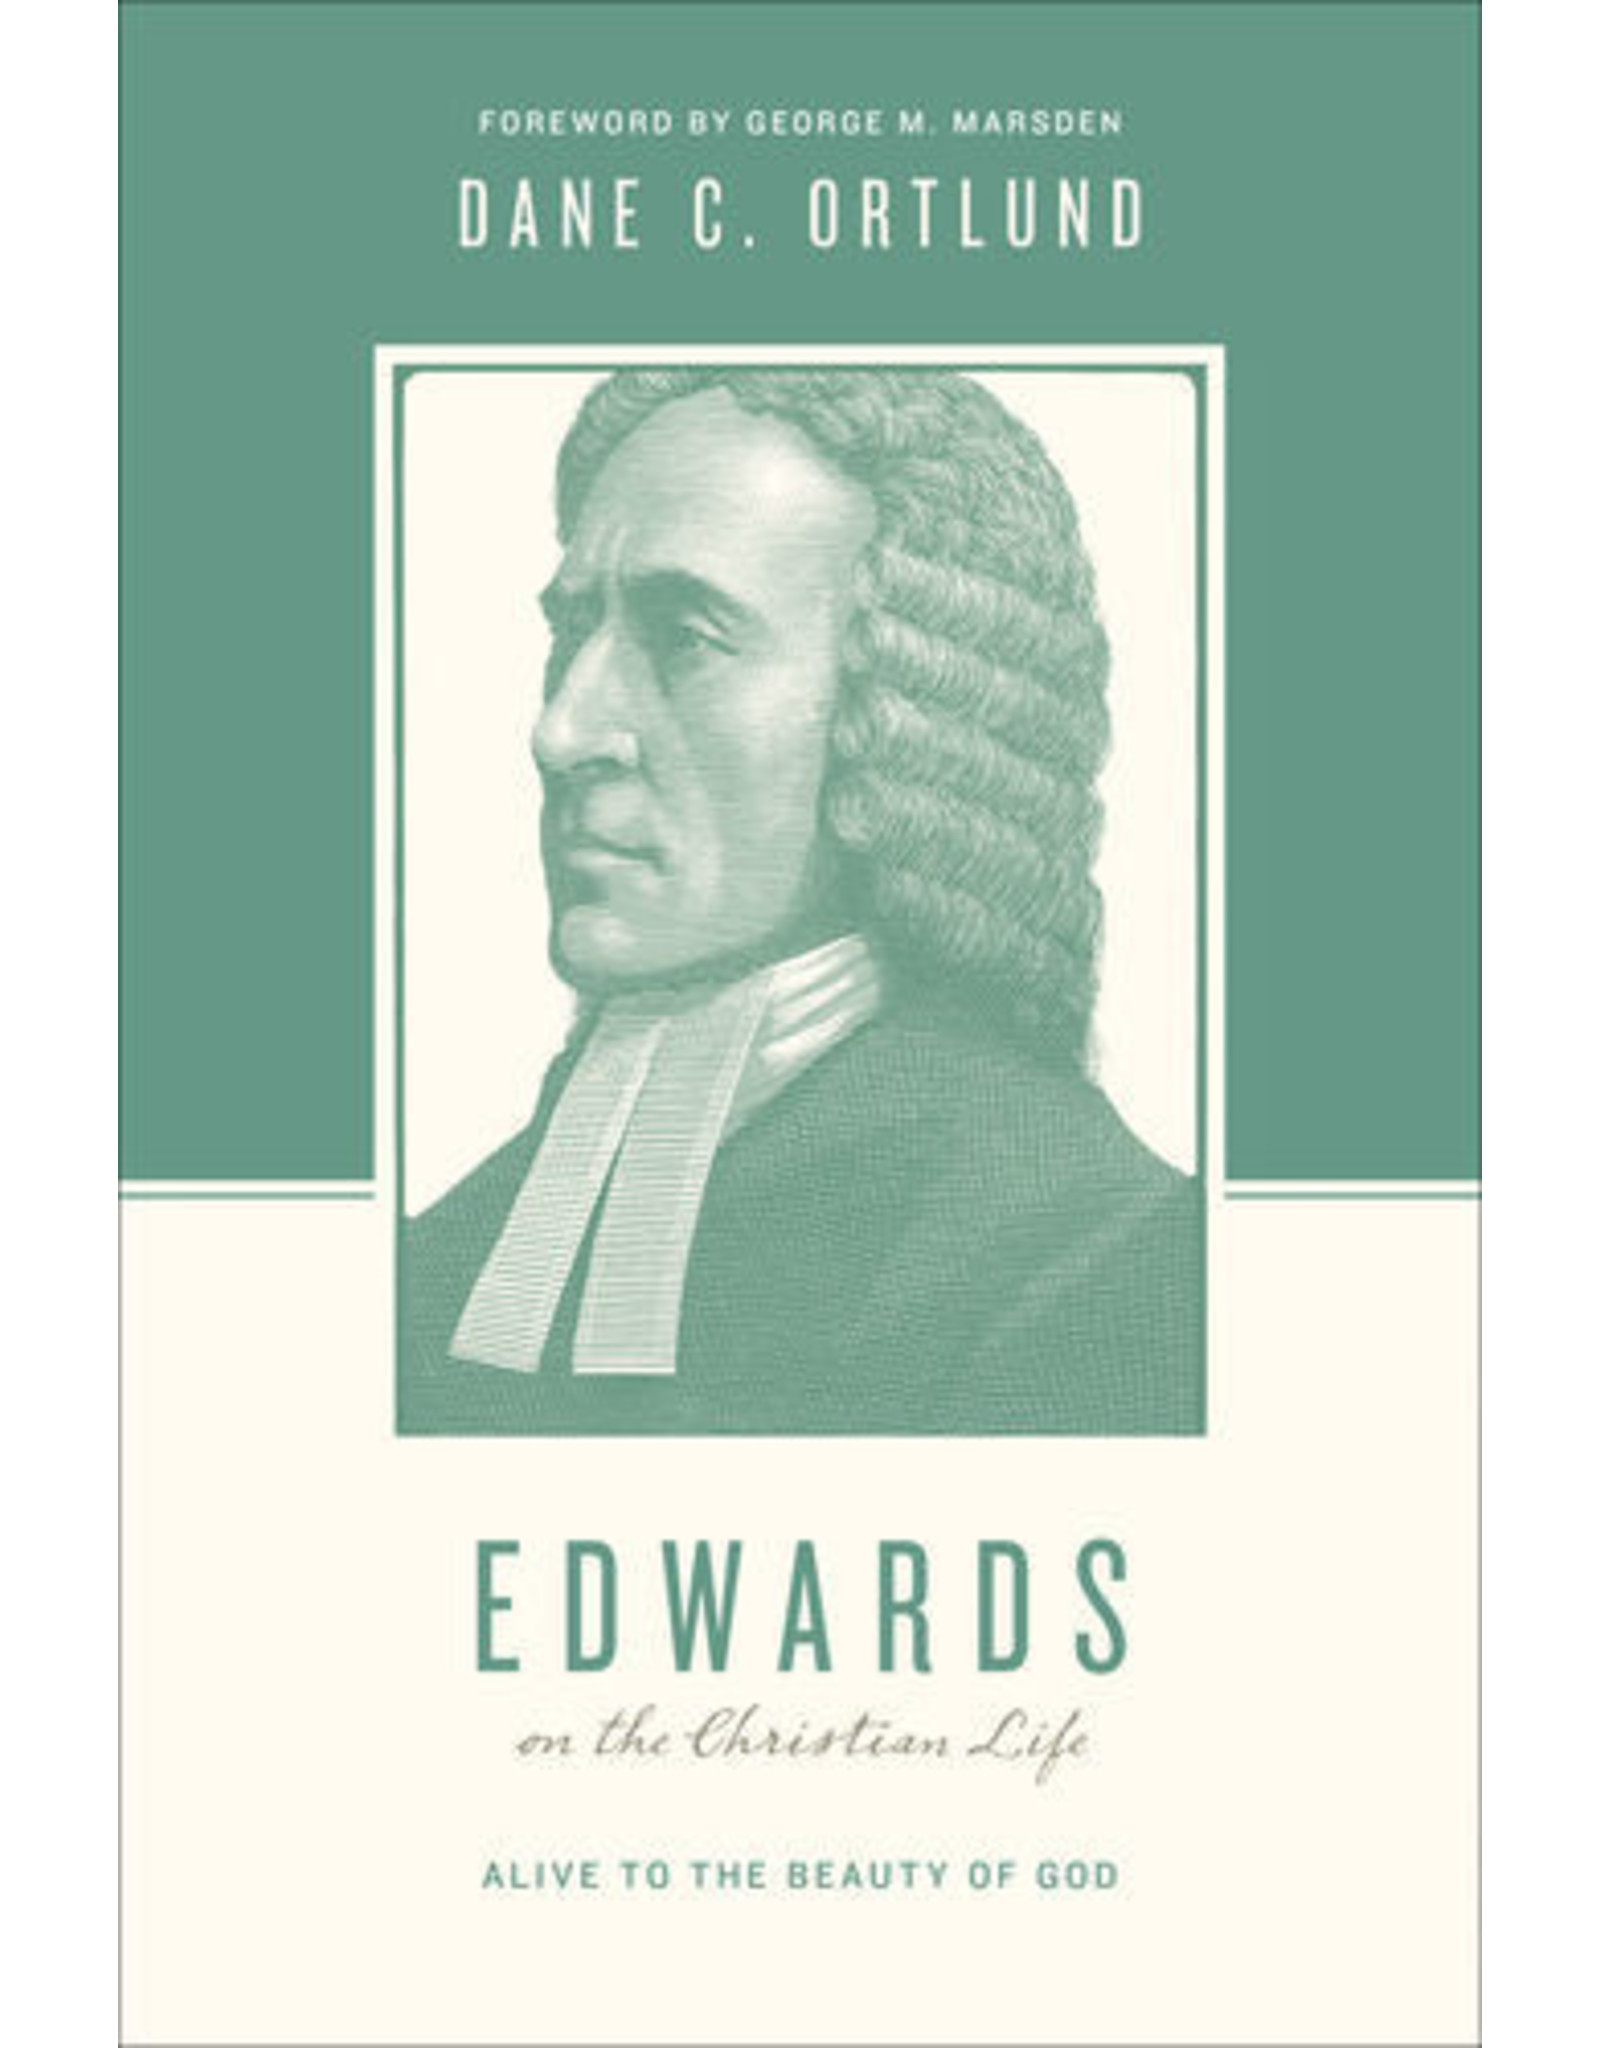 Ortlund Edwards on the Christian Life